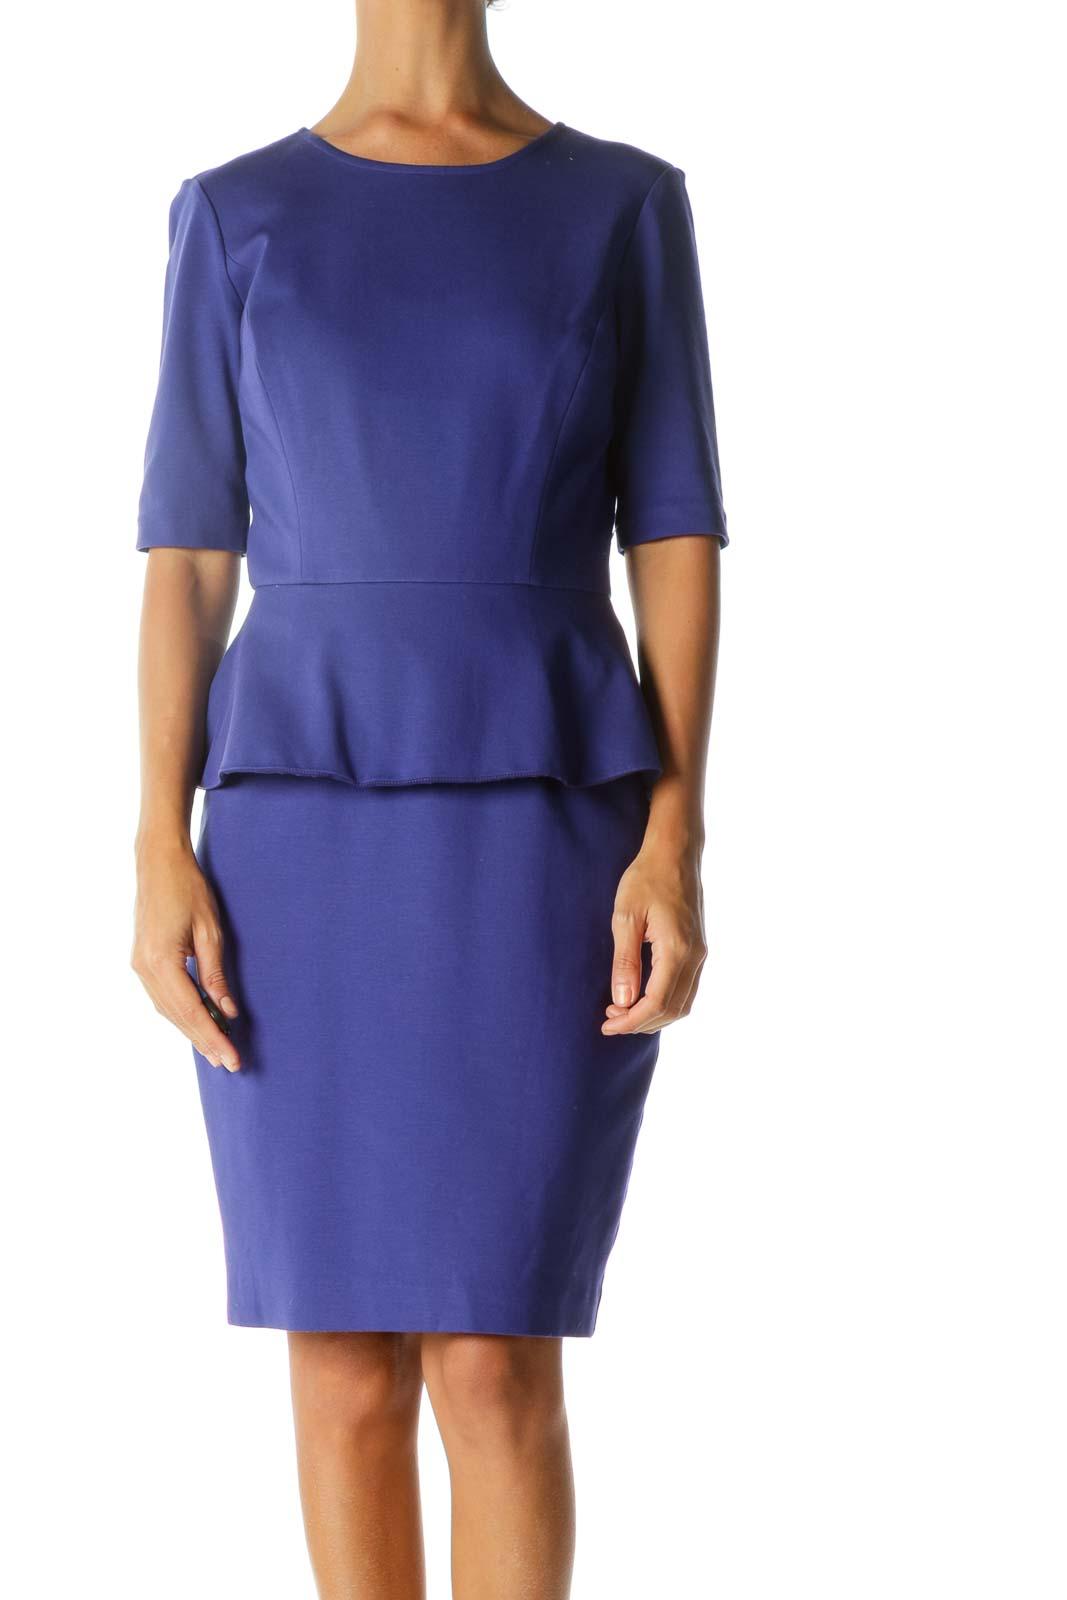 Royal Blue Short Sleeve Peplum Lace Lining Dress